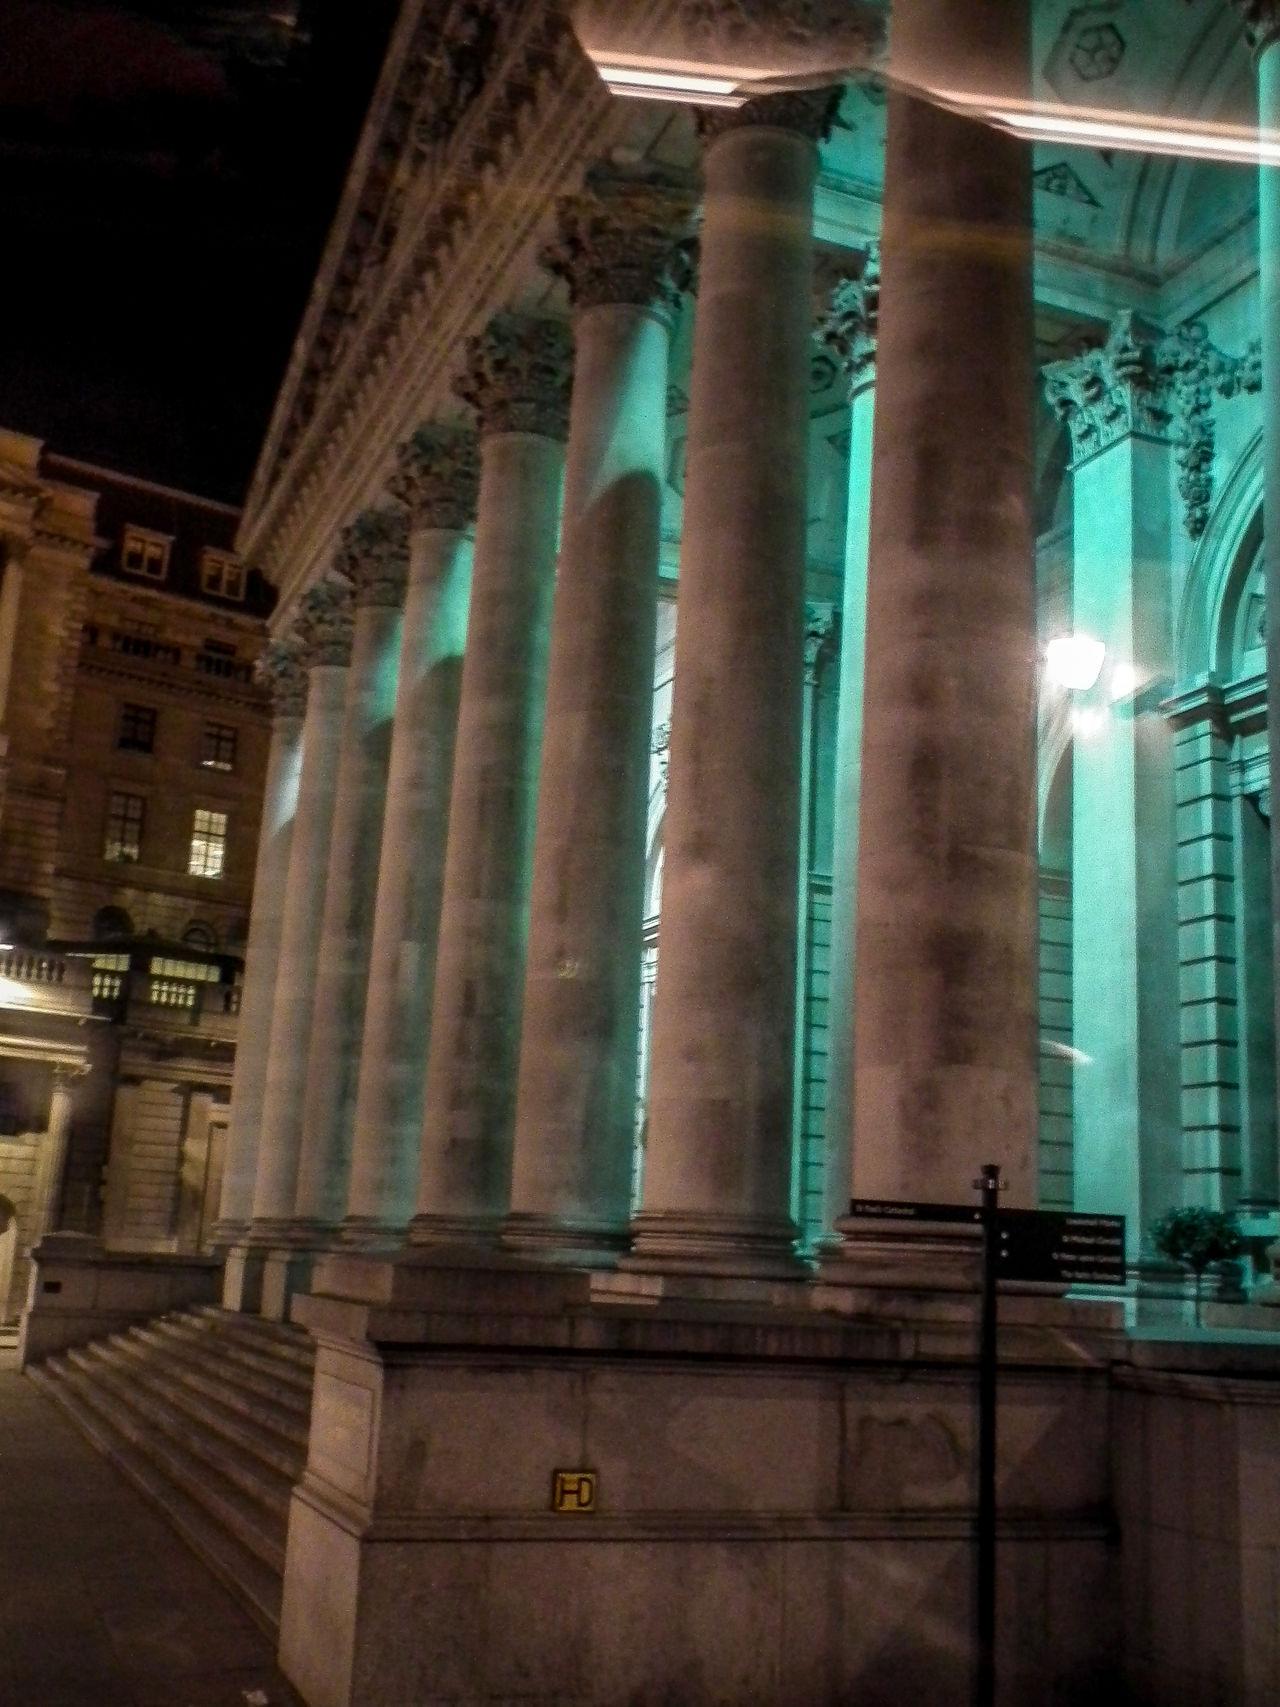 Architectural Column Architecture Built Structure Day England Gran Bretagna Great Britain Großbritannien Indoors  Inghilterra London Londra Nachtaufnahme Nachtfotografie Nightphotography No People